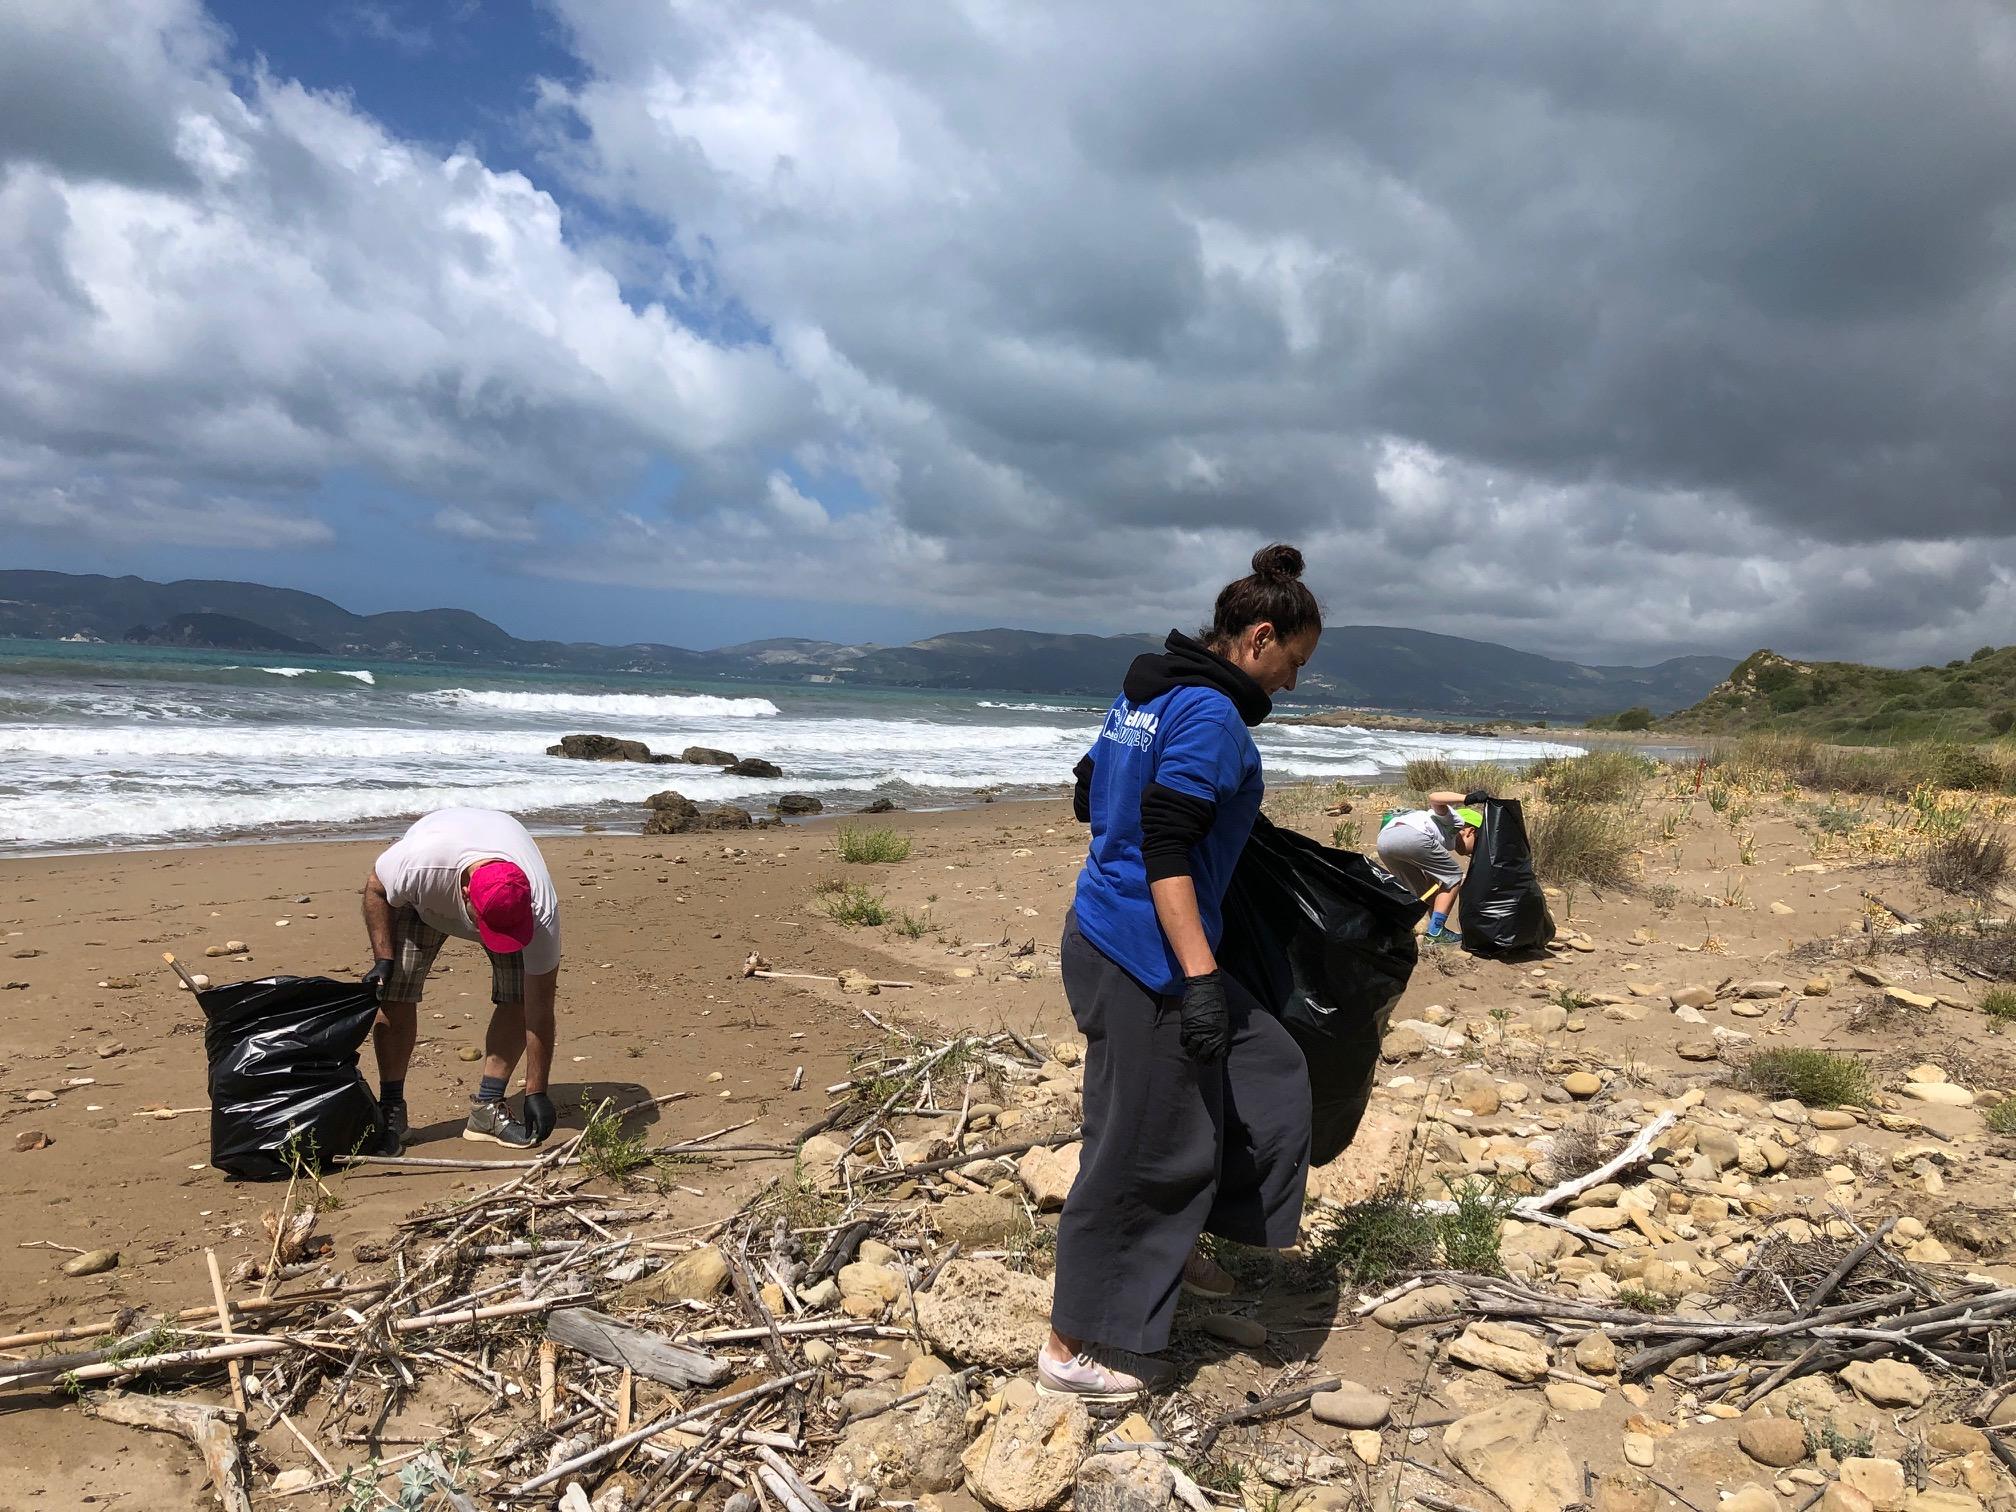 WWF Ελλάς: Ενίσχυση της προστασίας των καρέτα στη Μεσόγειο